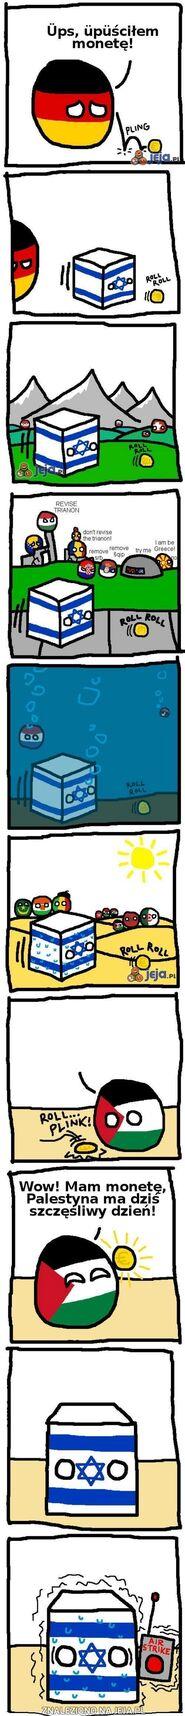 101289 palestyna